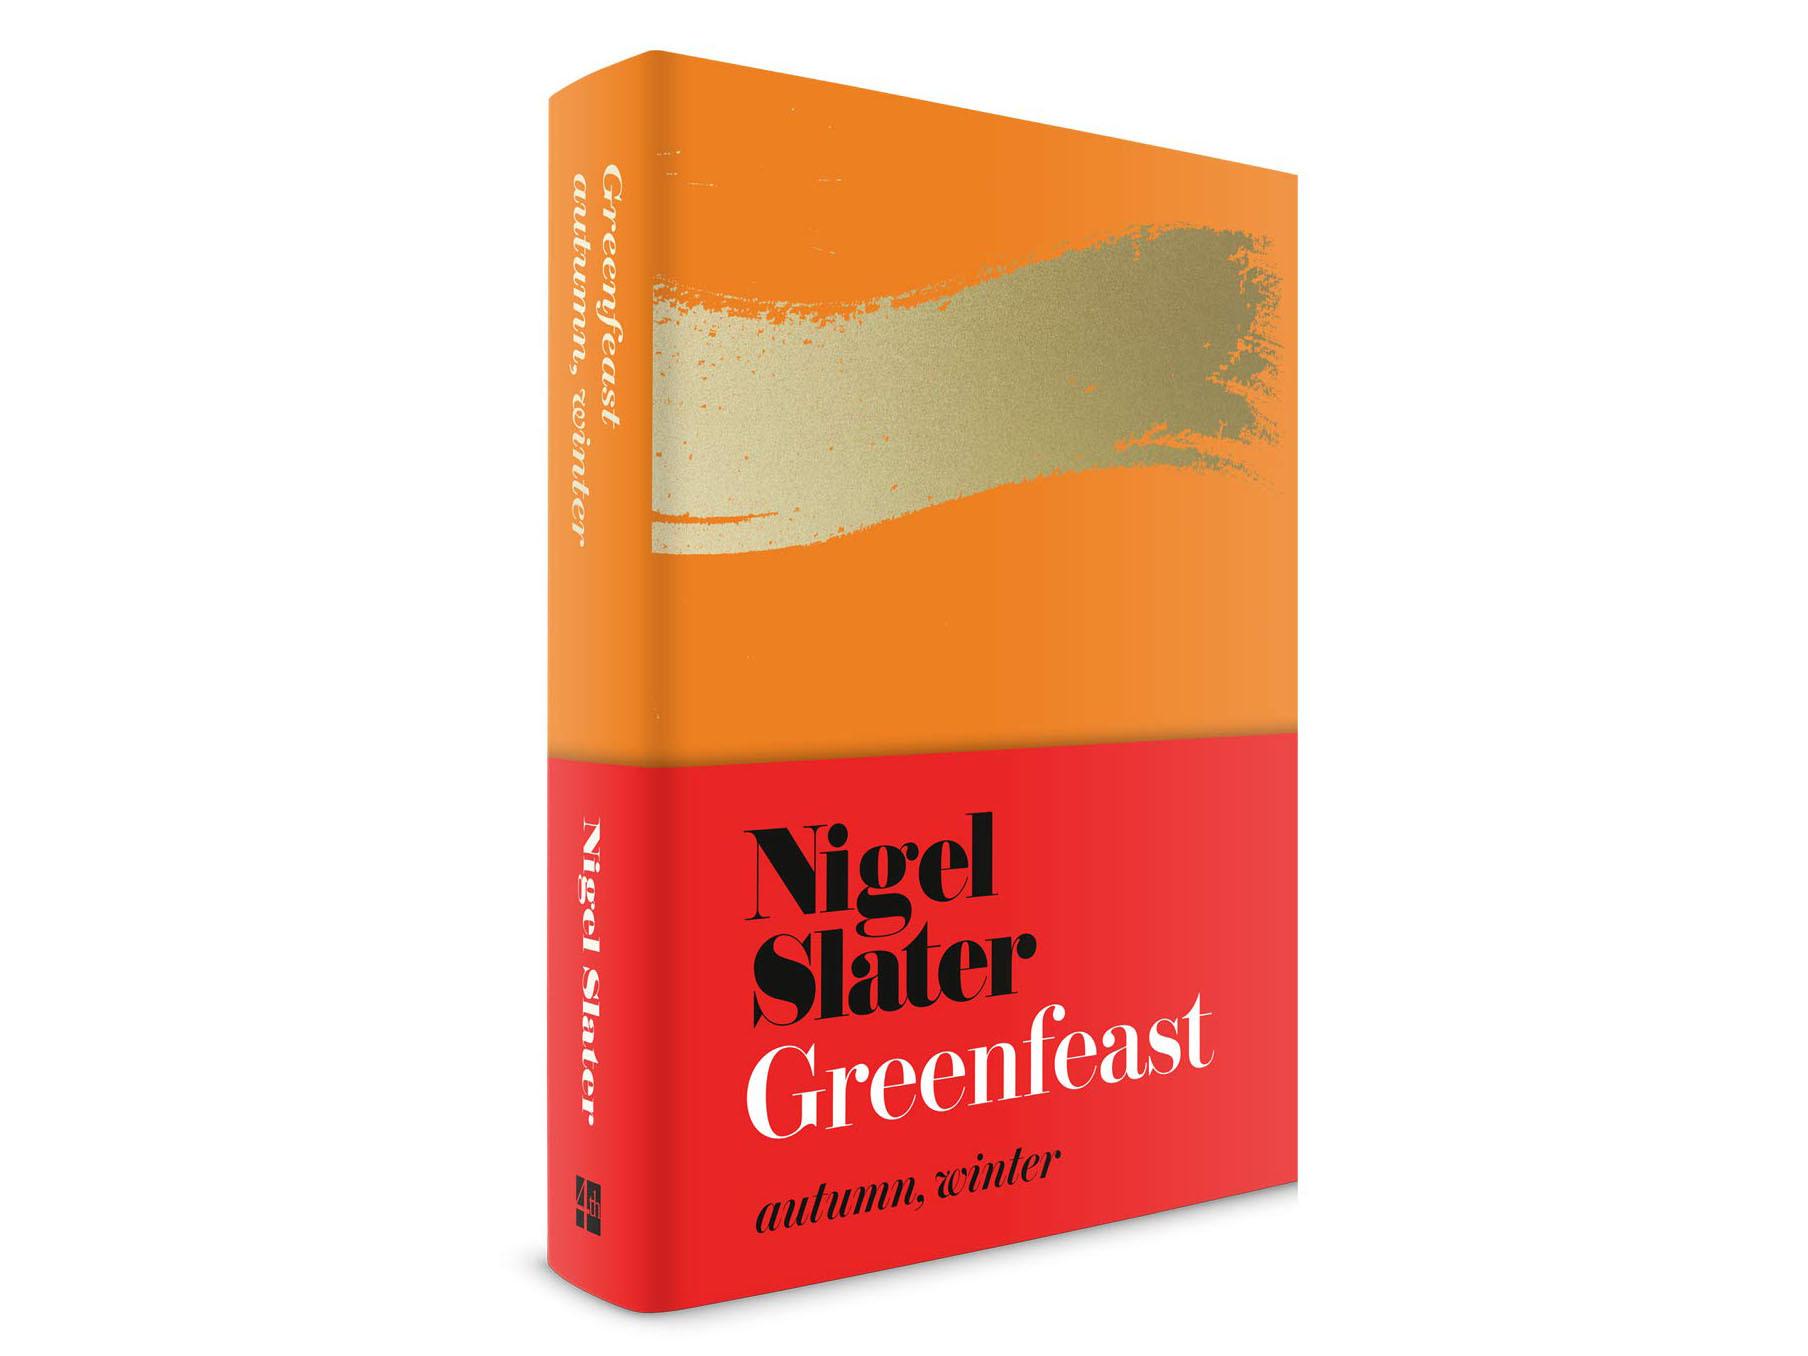 Nigel Slater Autumn Winter Greenfeast